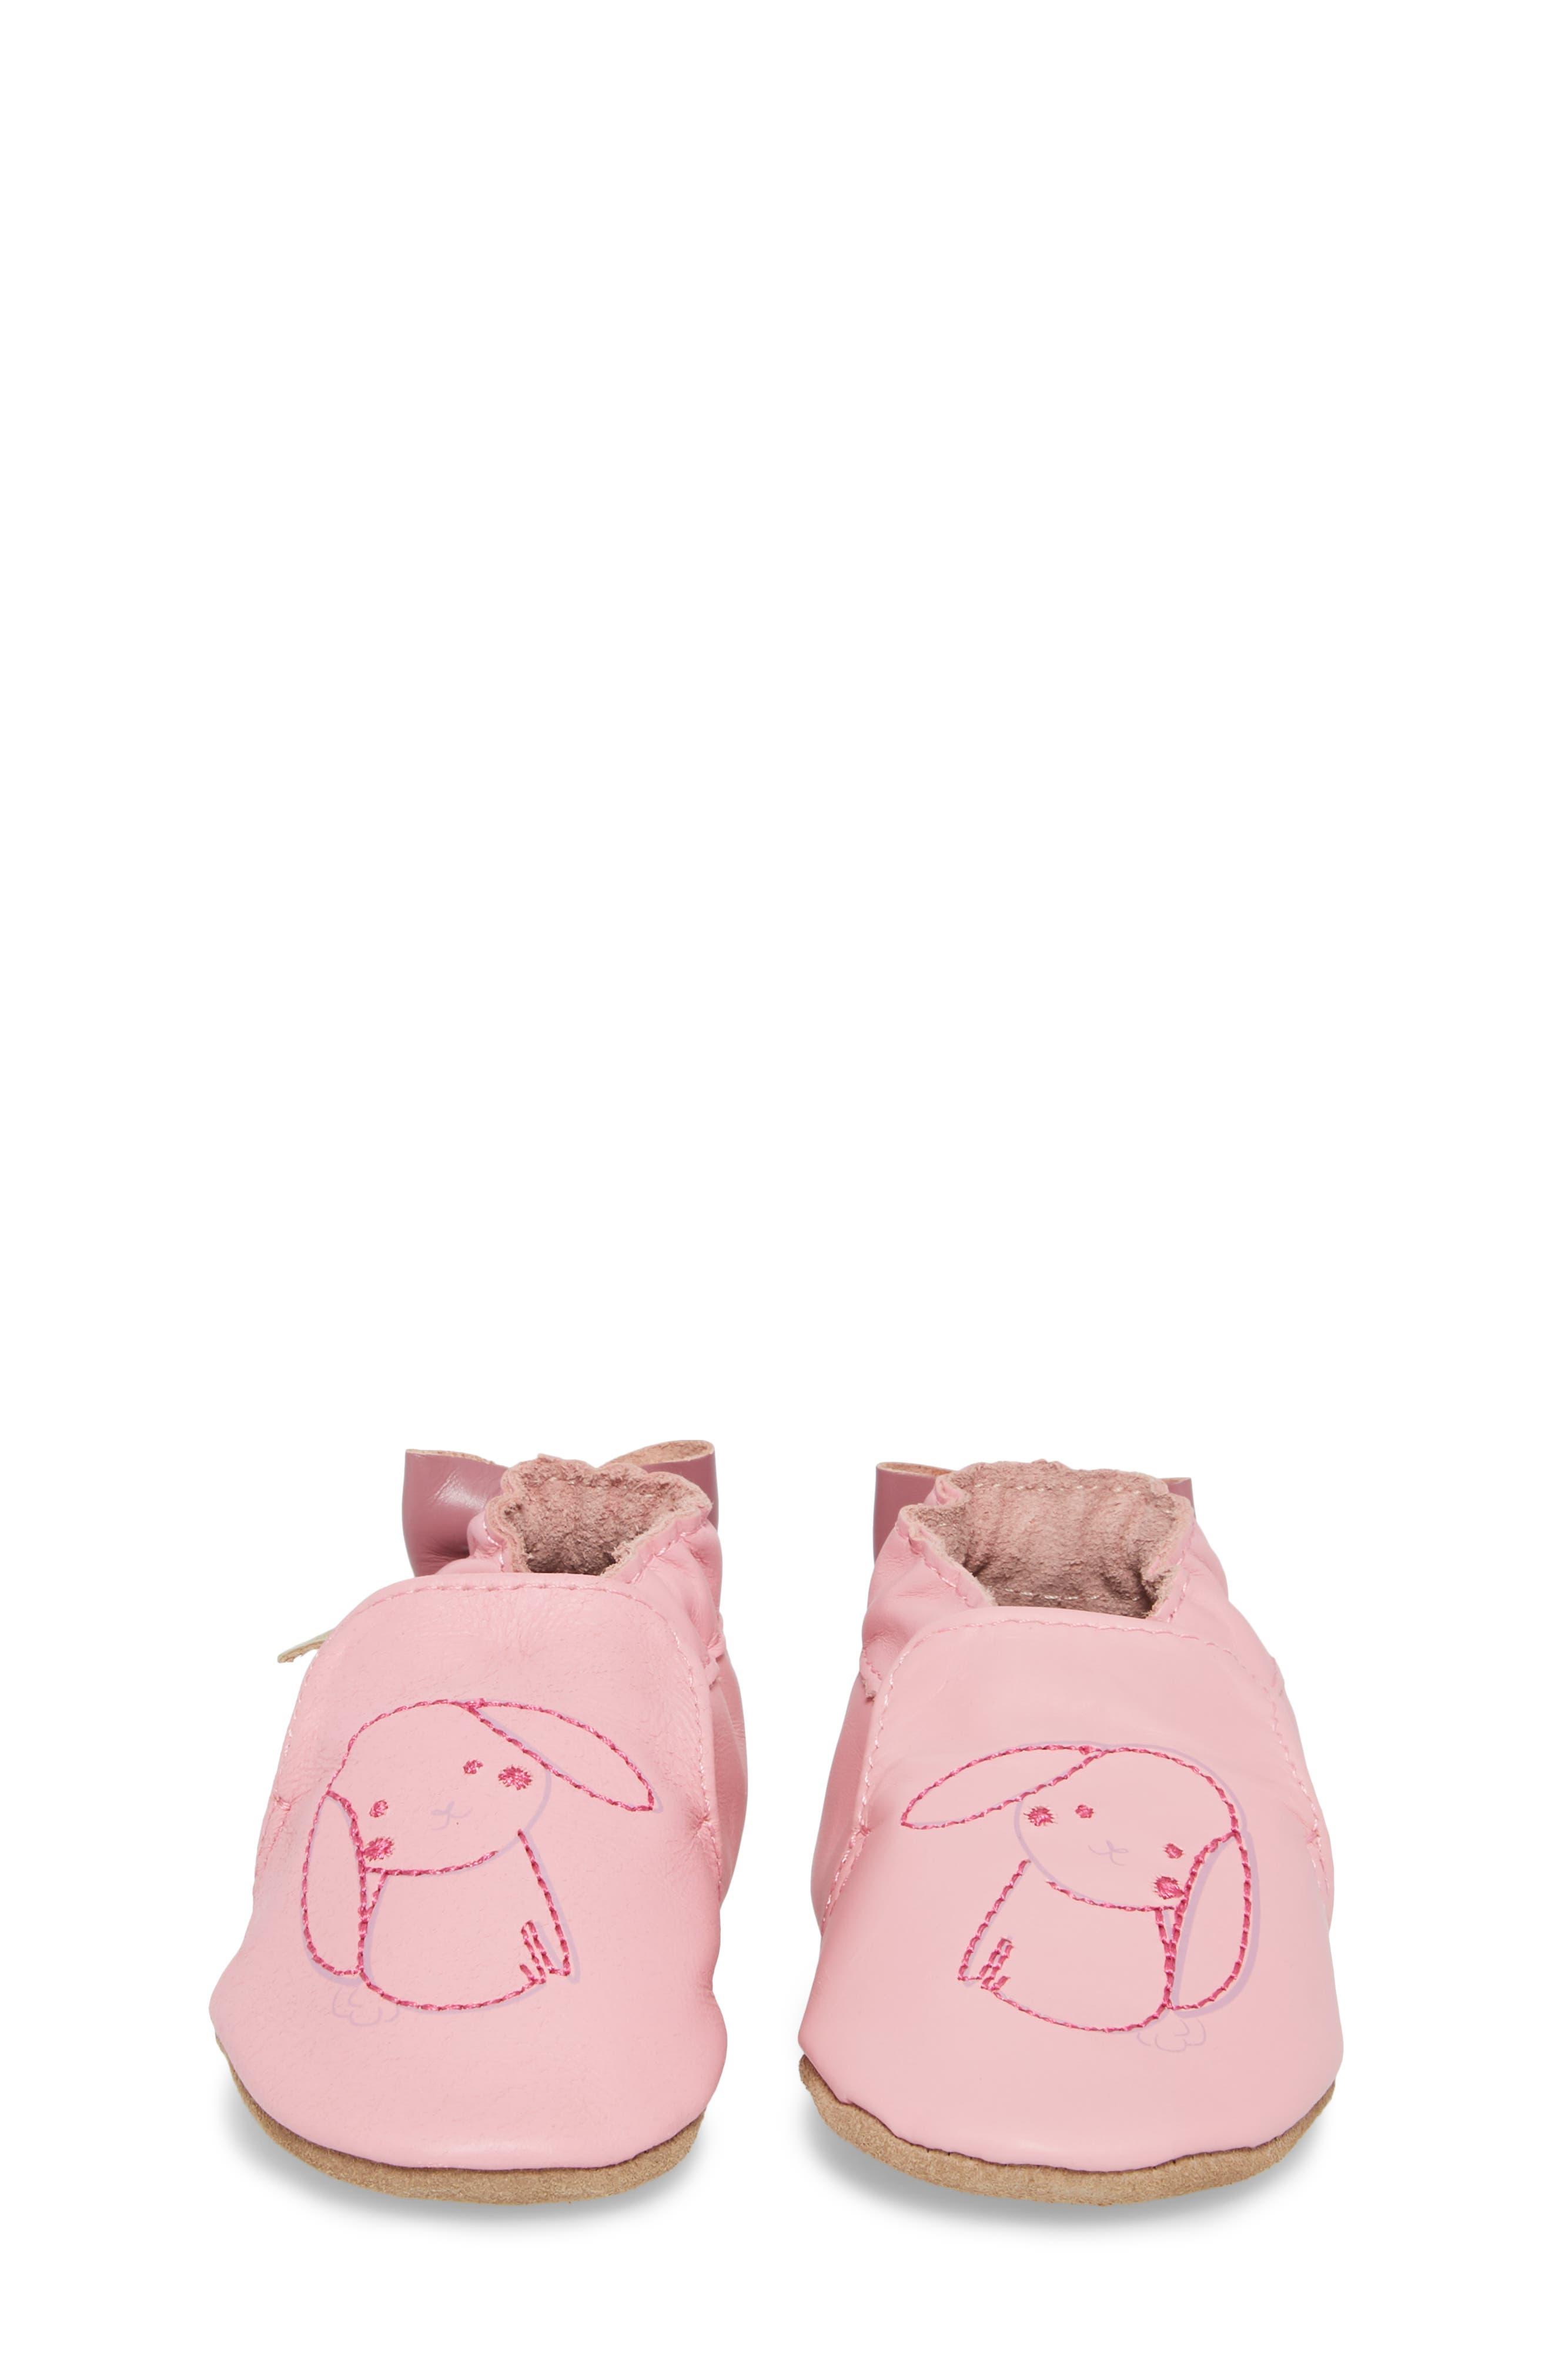 Sweet Bunny Moccasin Crib Shoe,                             Alternate thumbnail 5, color,                             Pastel Pink